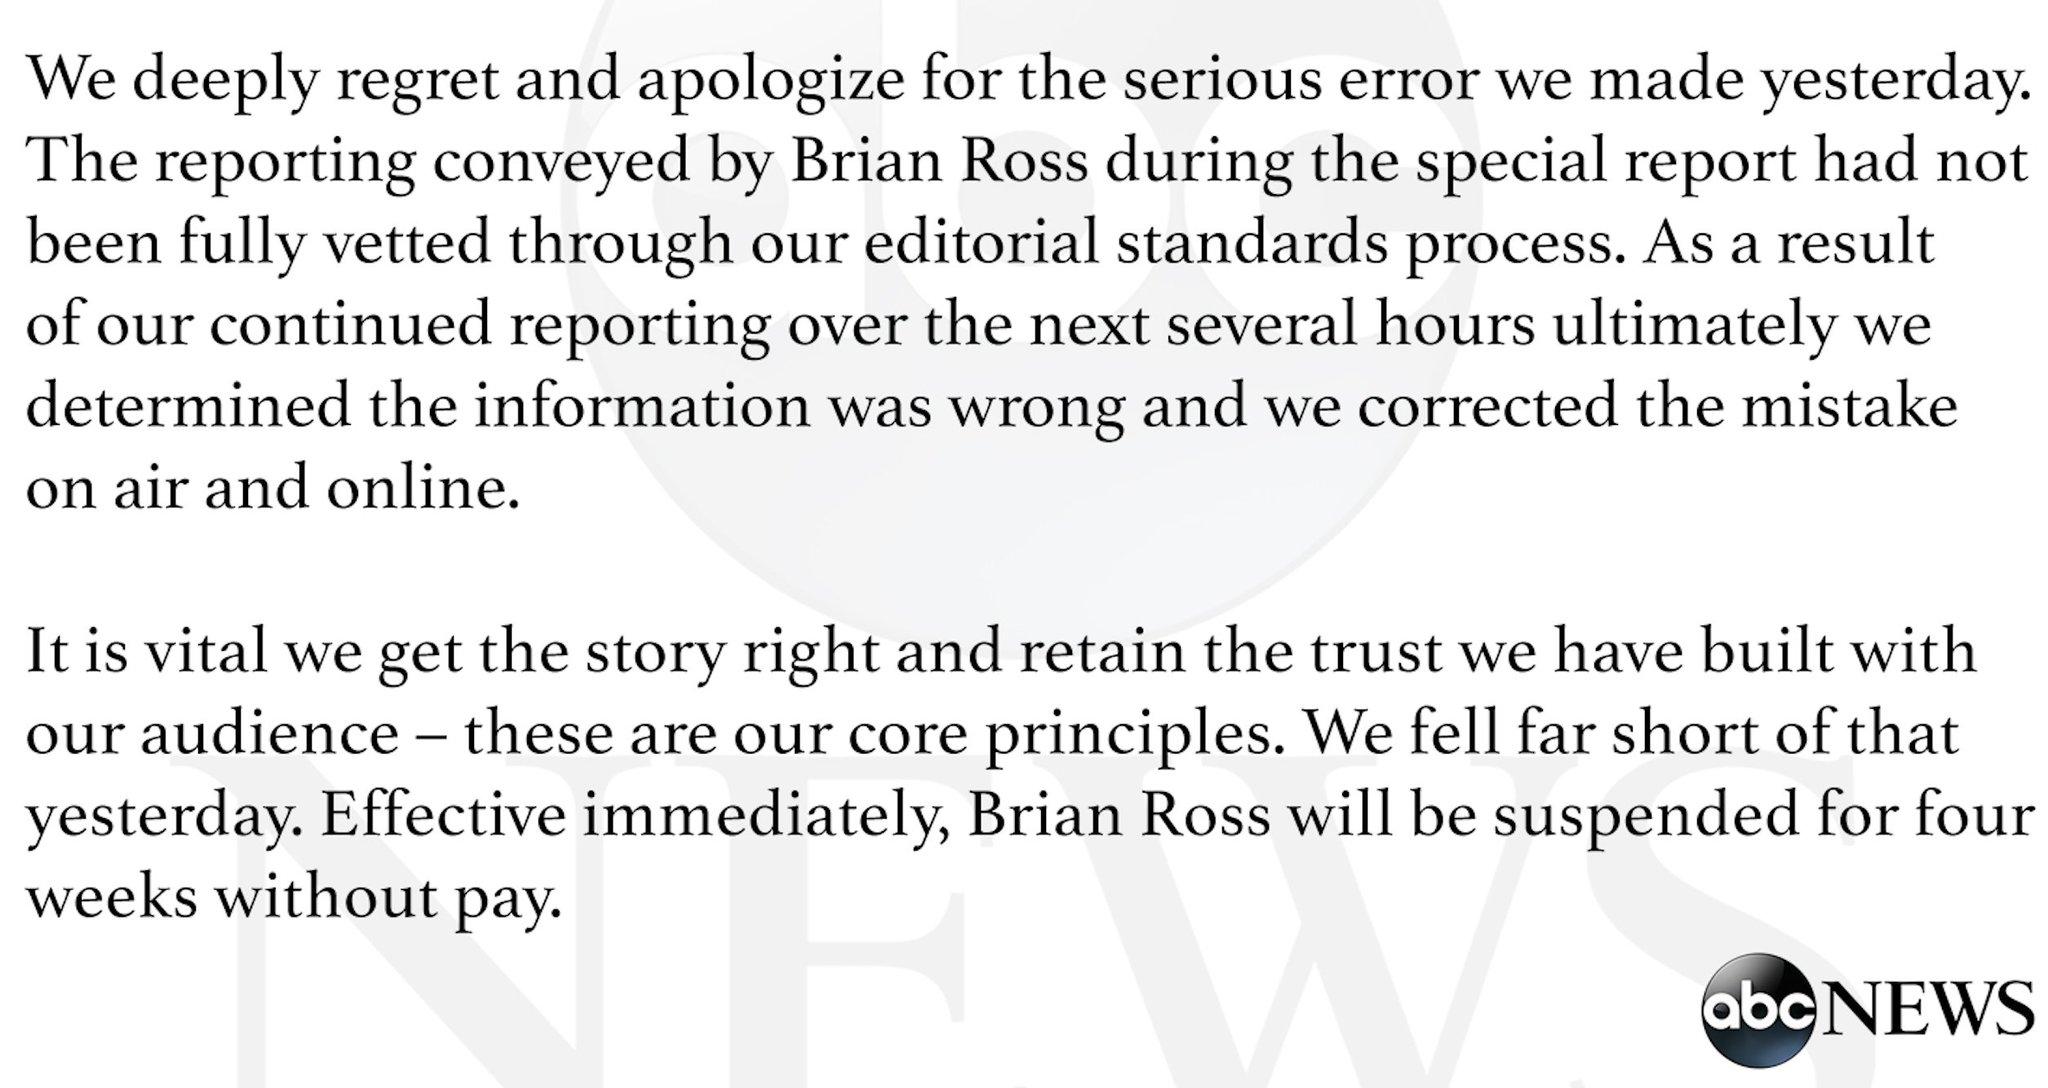 RT @ABC: .@ABC News statement on Michael Flynn report: https://t.co/sd9TeFiiLQ https://t.co/UtHFHeuwcM